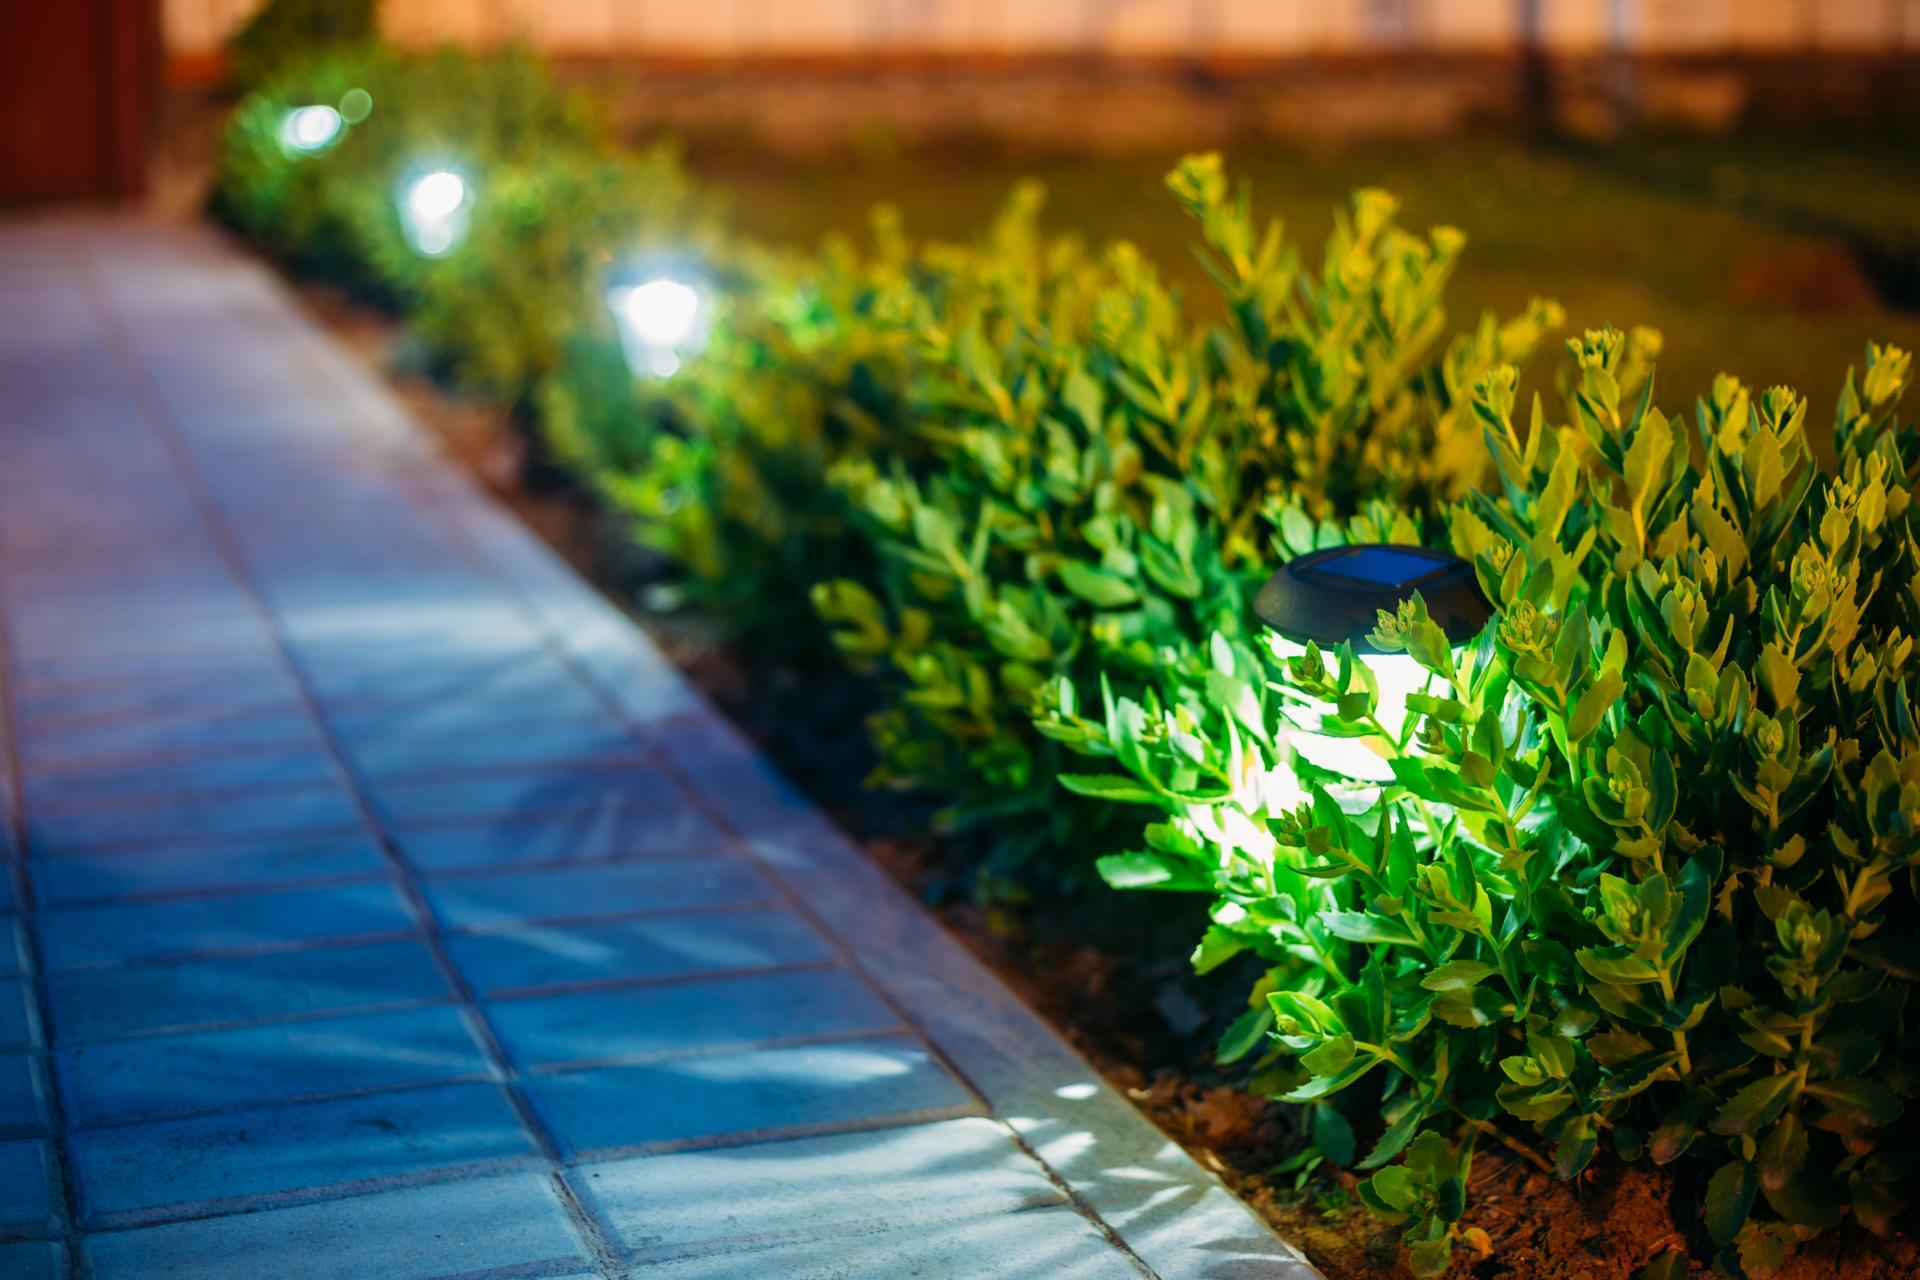 sidewalk light